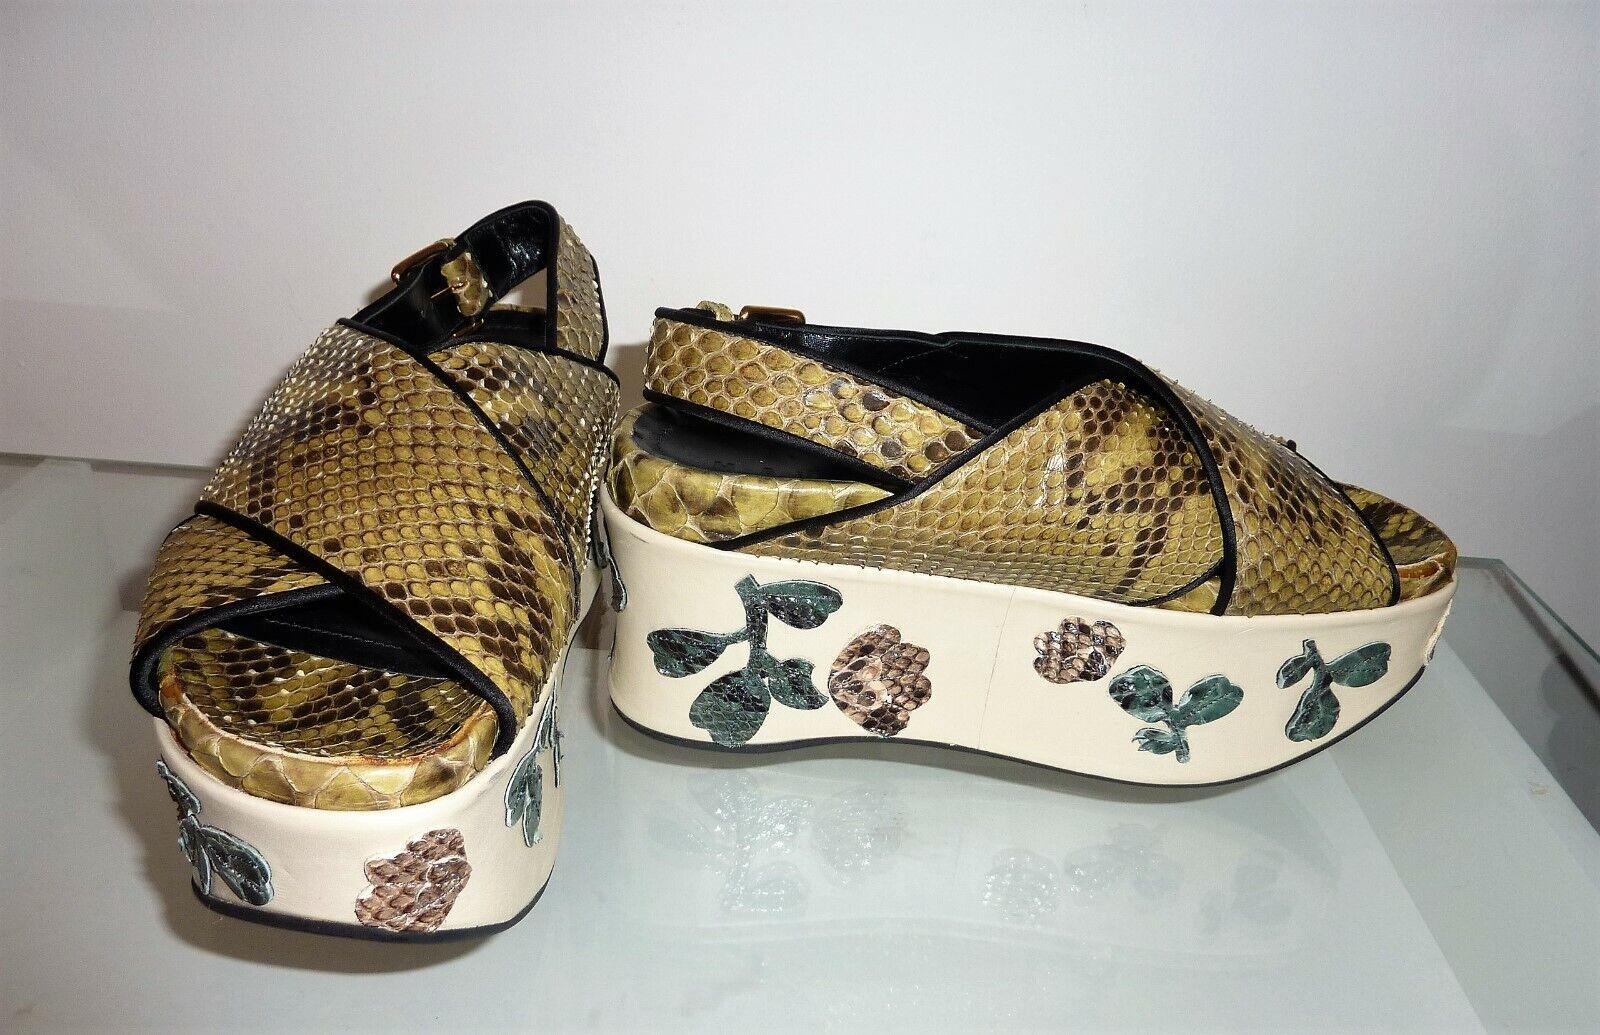 Marni zapatos Real Python Talla 40